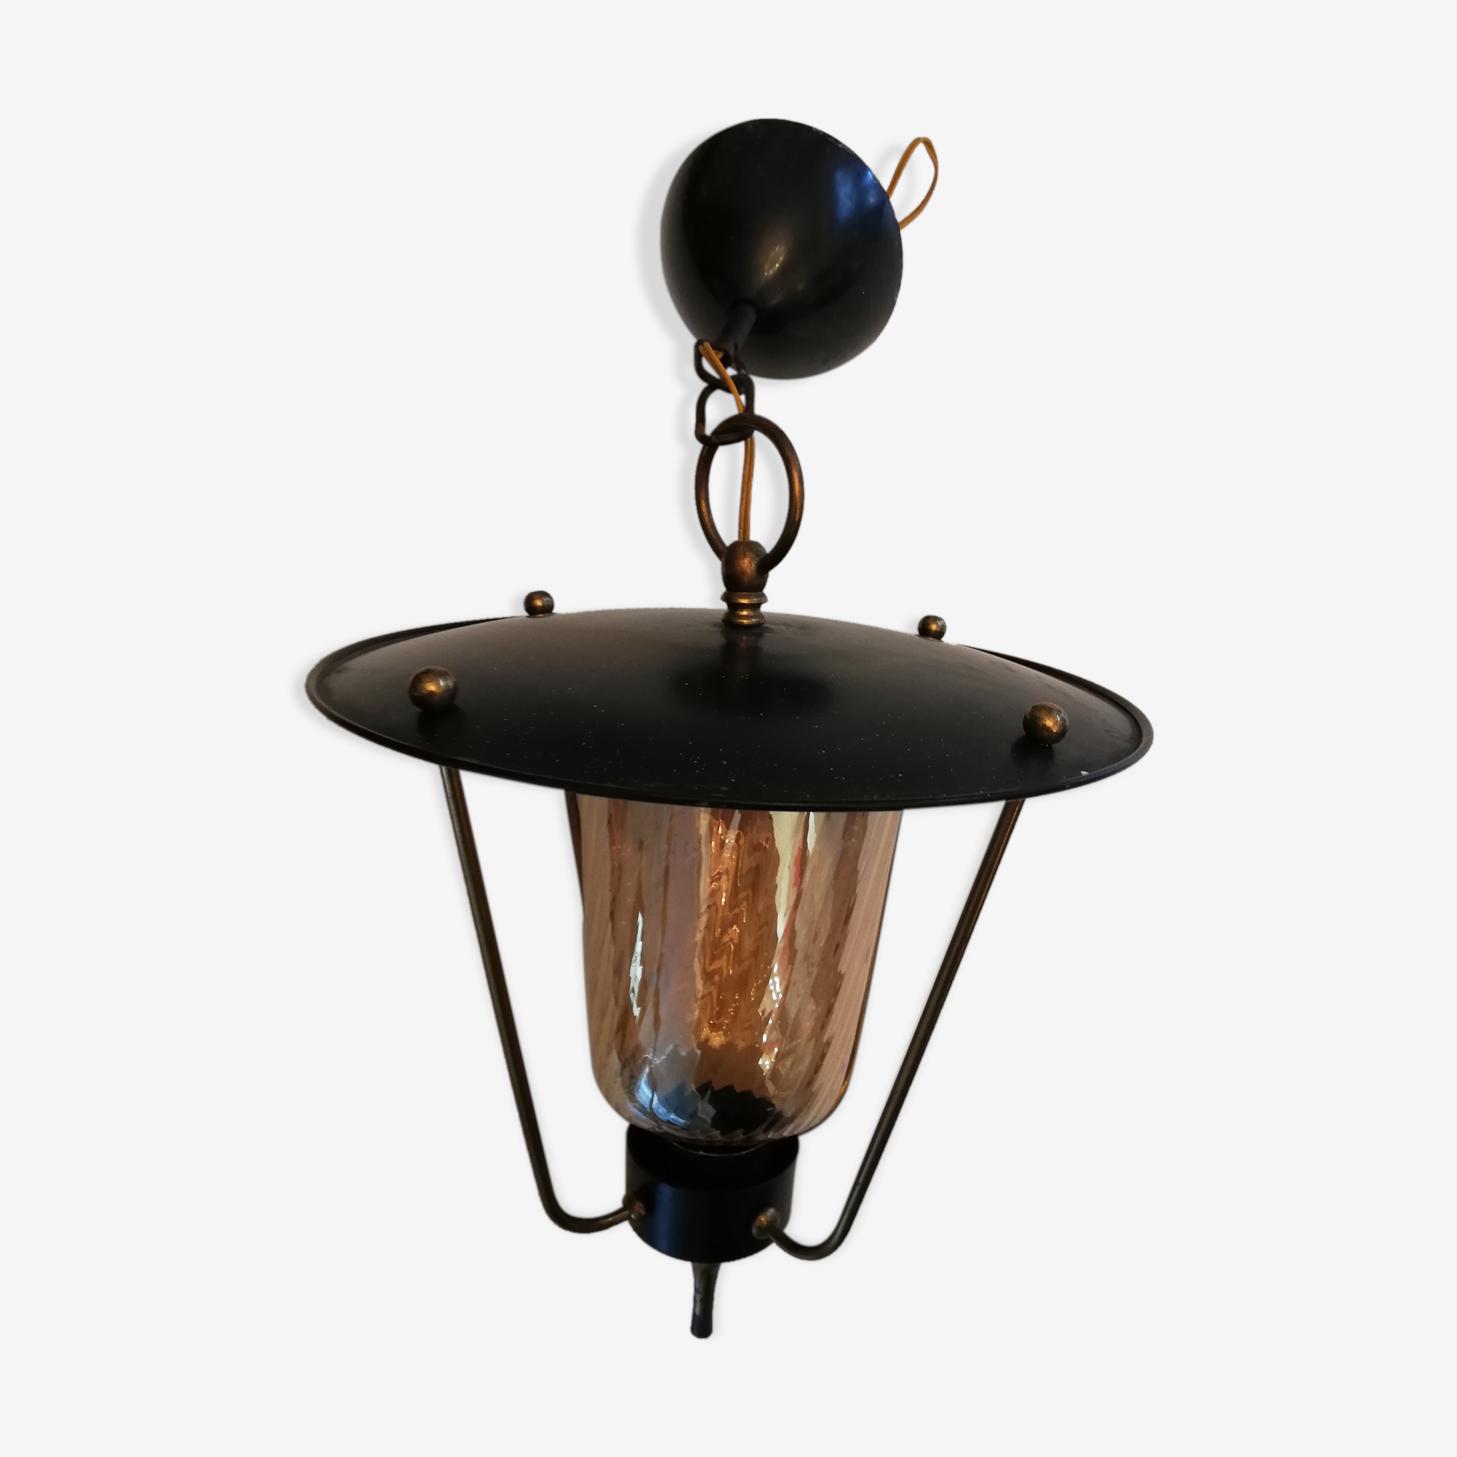 Lustre lanterne tôle et verre vintage 50/60